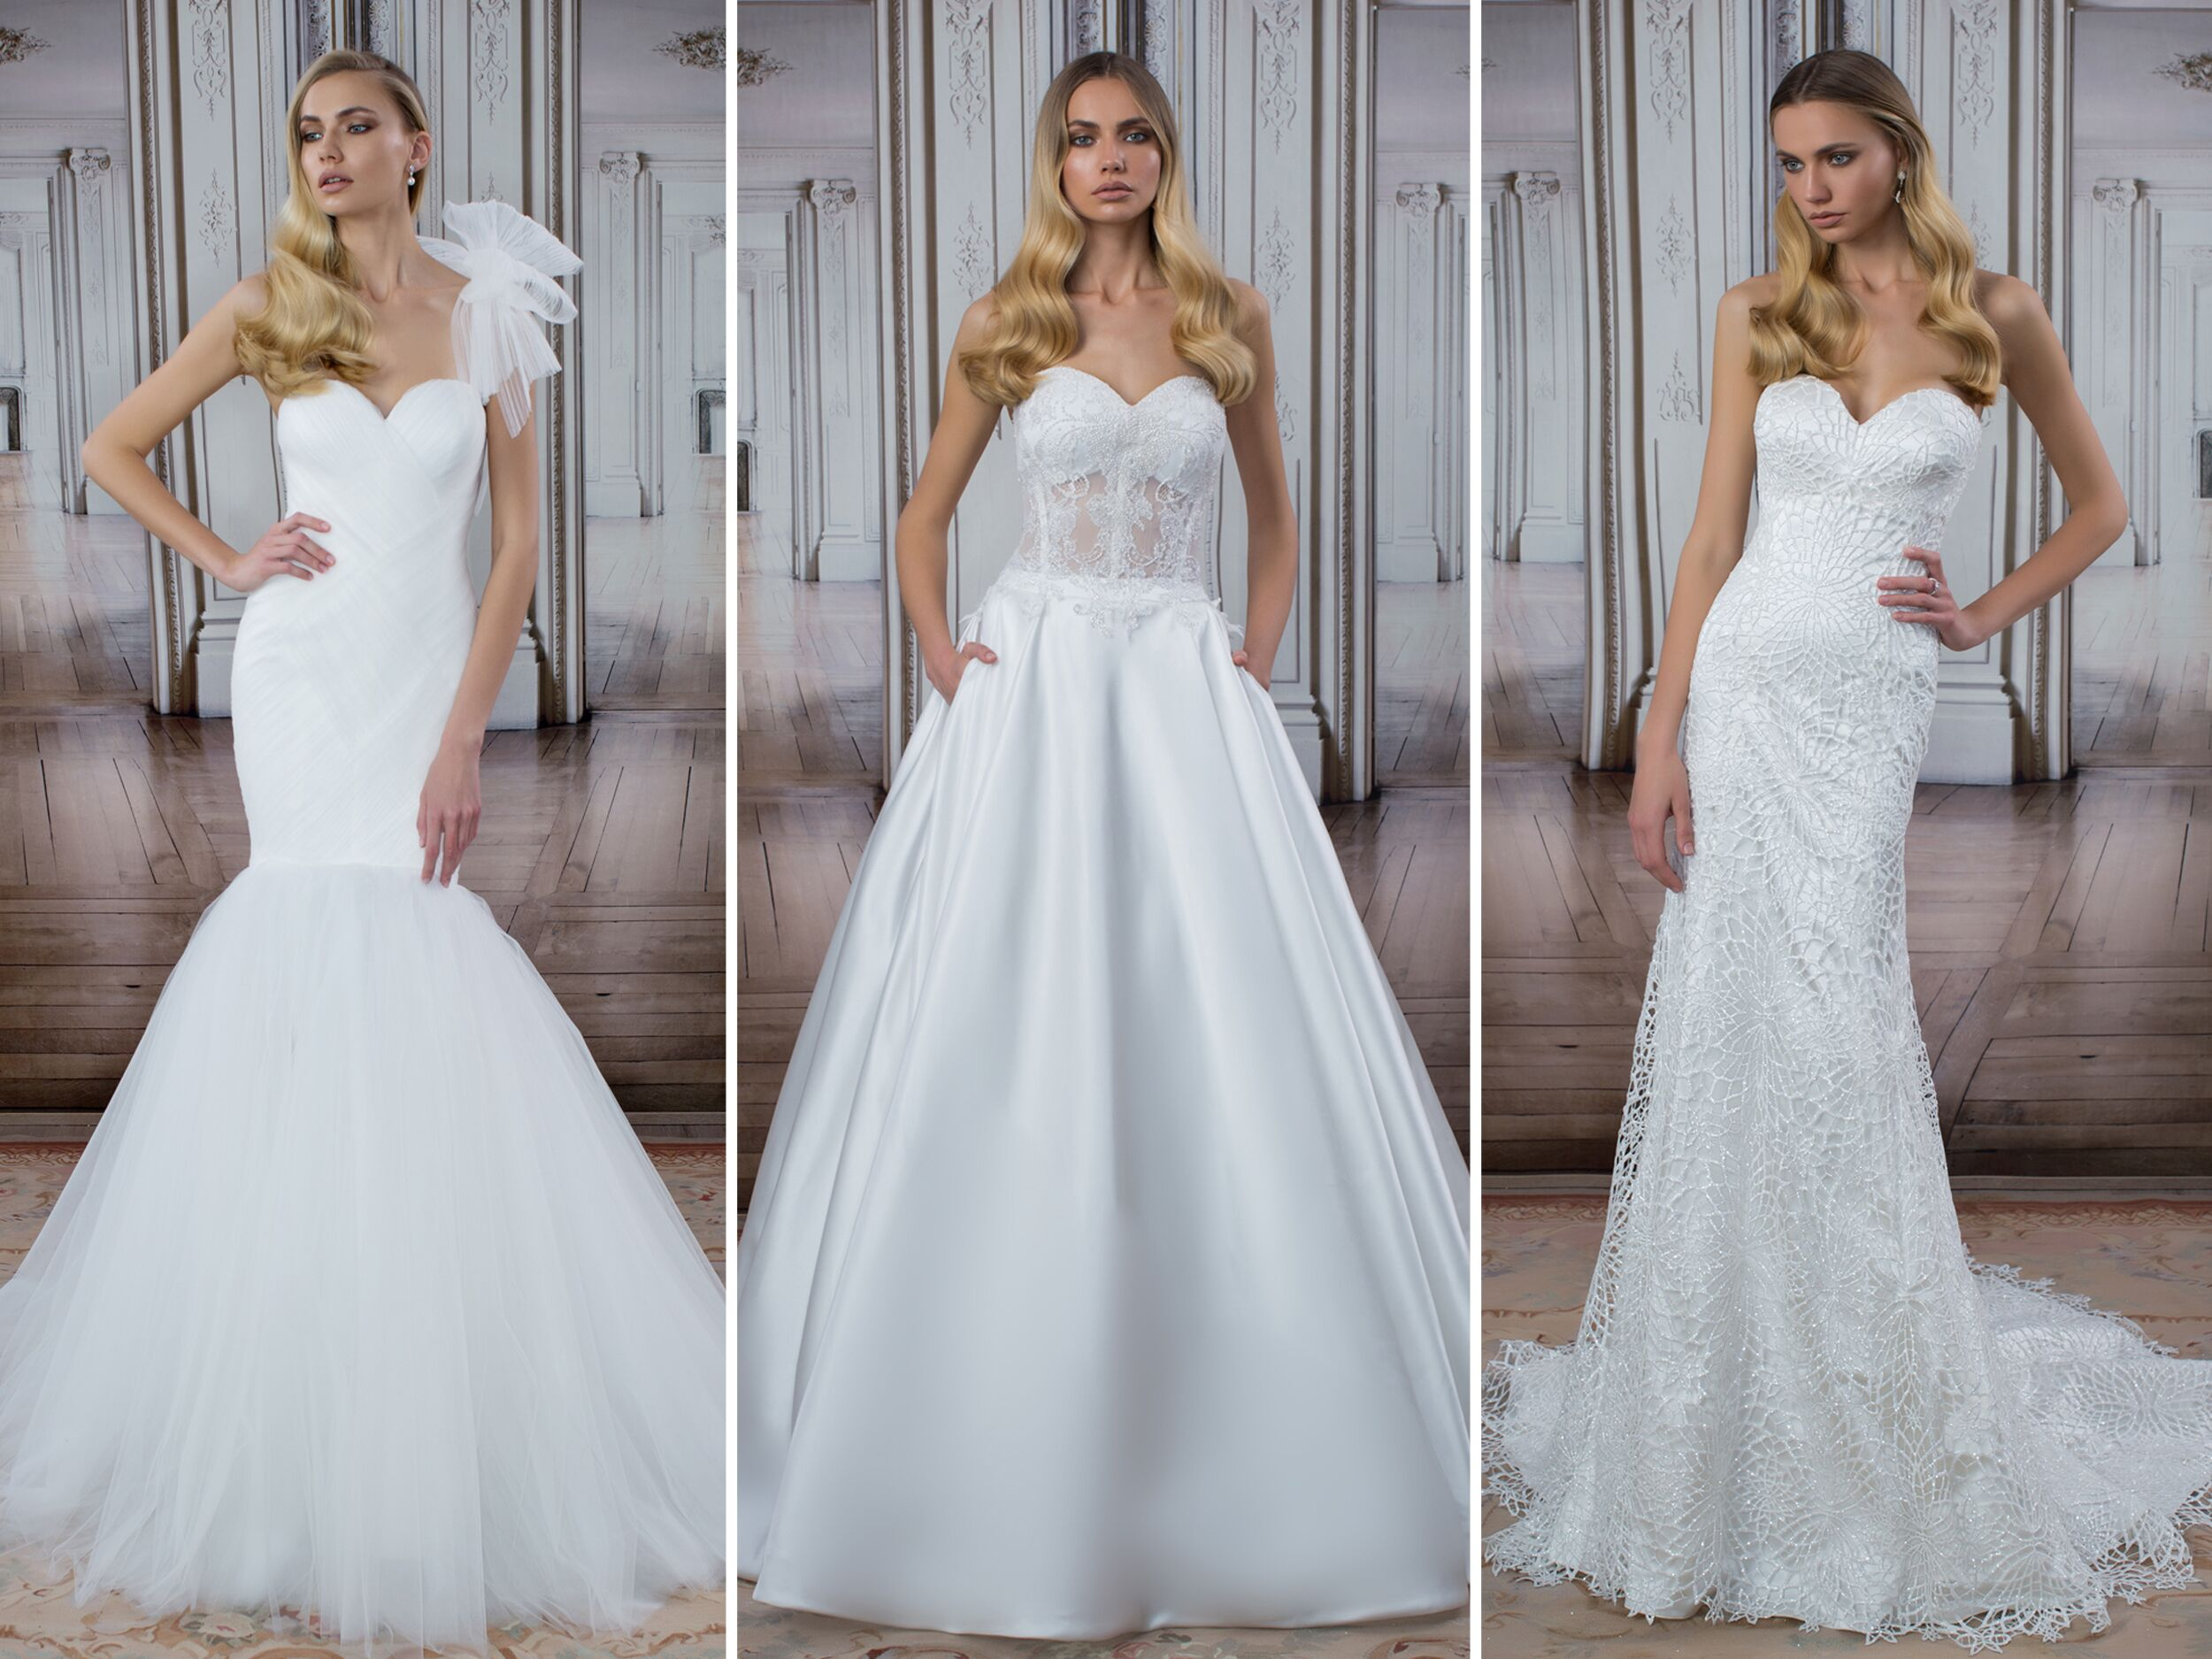 Best Of Wedding Dresses Pnina tornai – Wedding